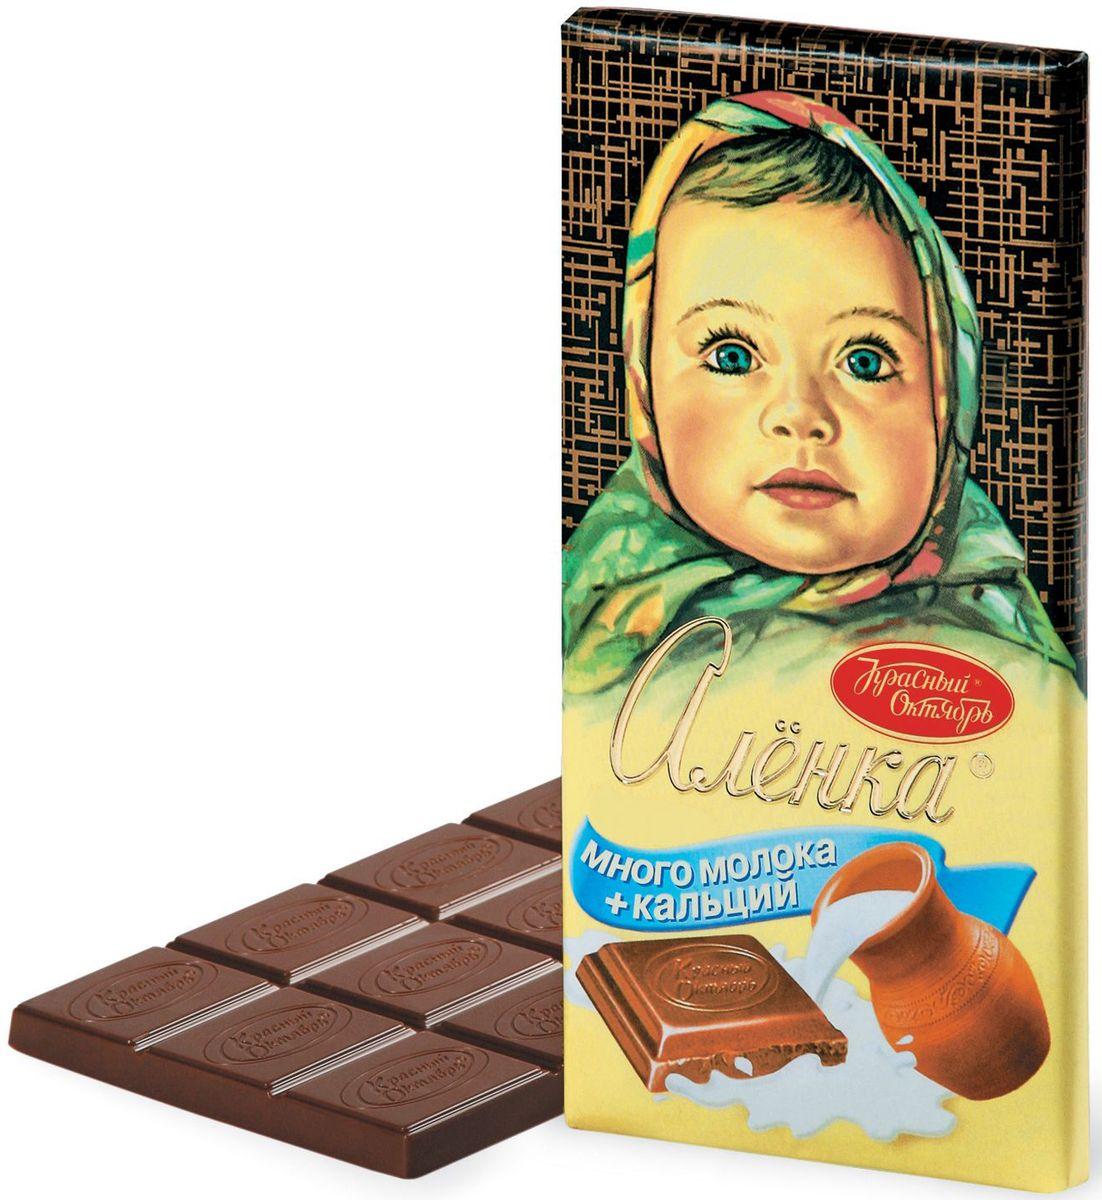 Красный Октябрь Аленка много молока молочный шоколад, 100 г bravolli чечевица красная 350 г